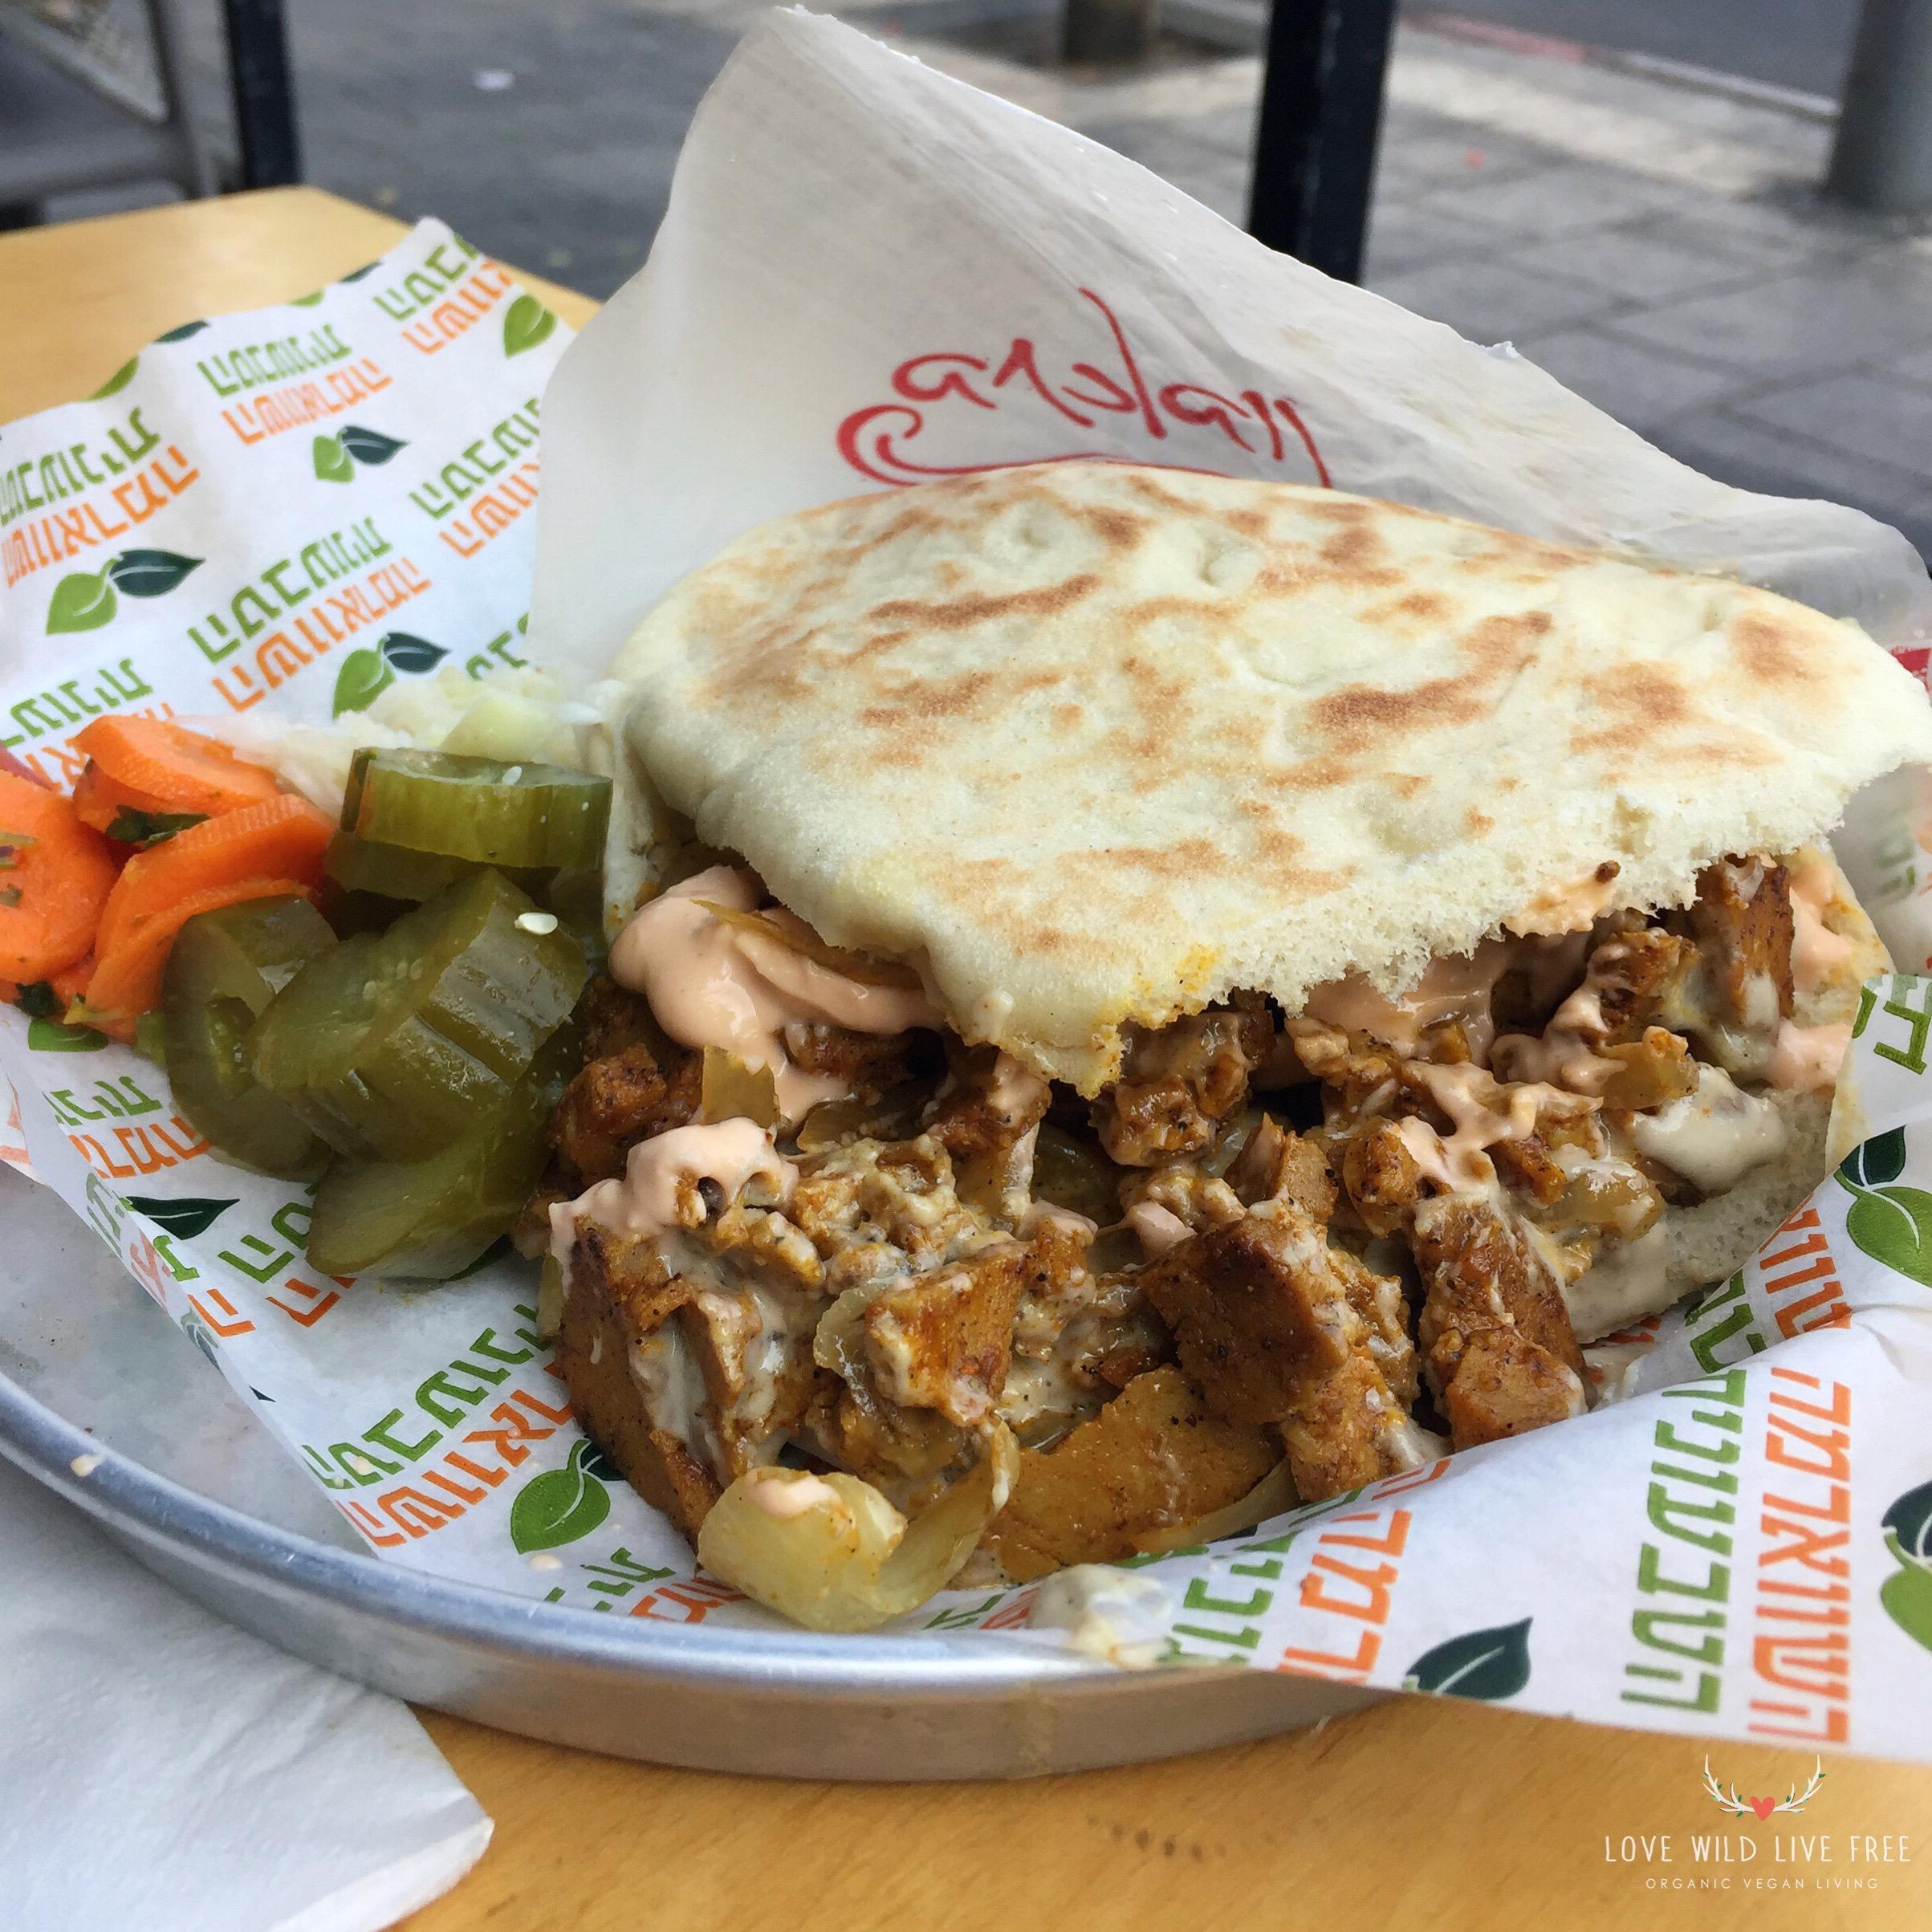 The Vegan Shawarma of my dreams:Seitan-based shawarma done right at The Vegan Shwarma in Tel Aviv.  Photo by Love Wild Live Free.